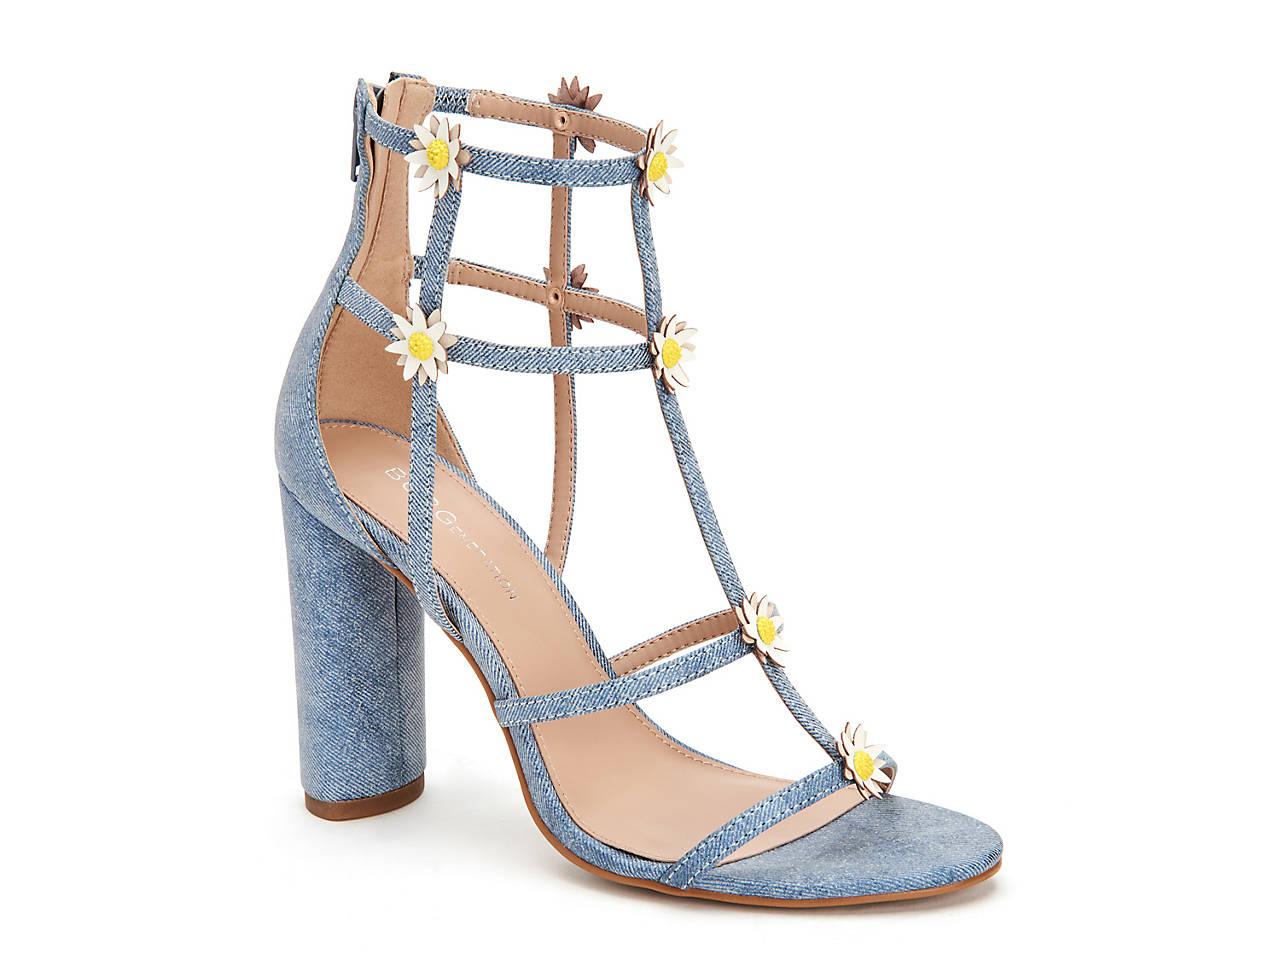 aaed2f29b5c4 BCBGeneration Jordan Sandal Women s Shoes